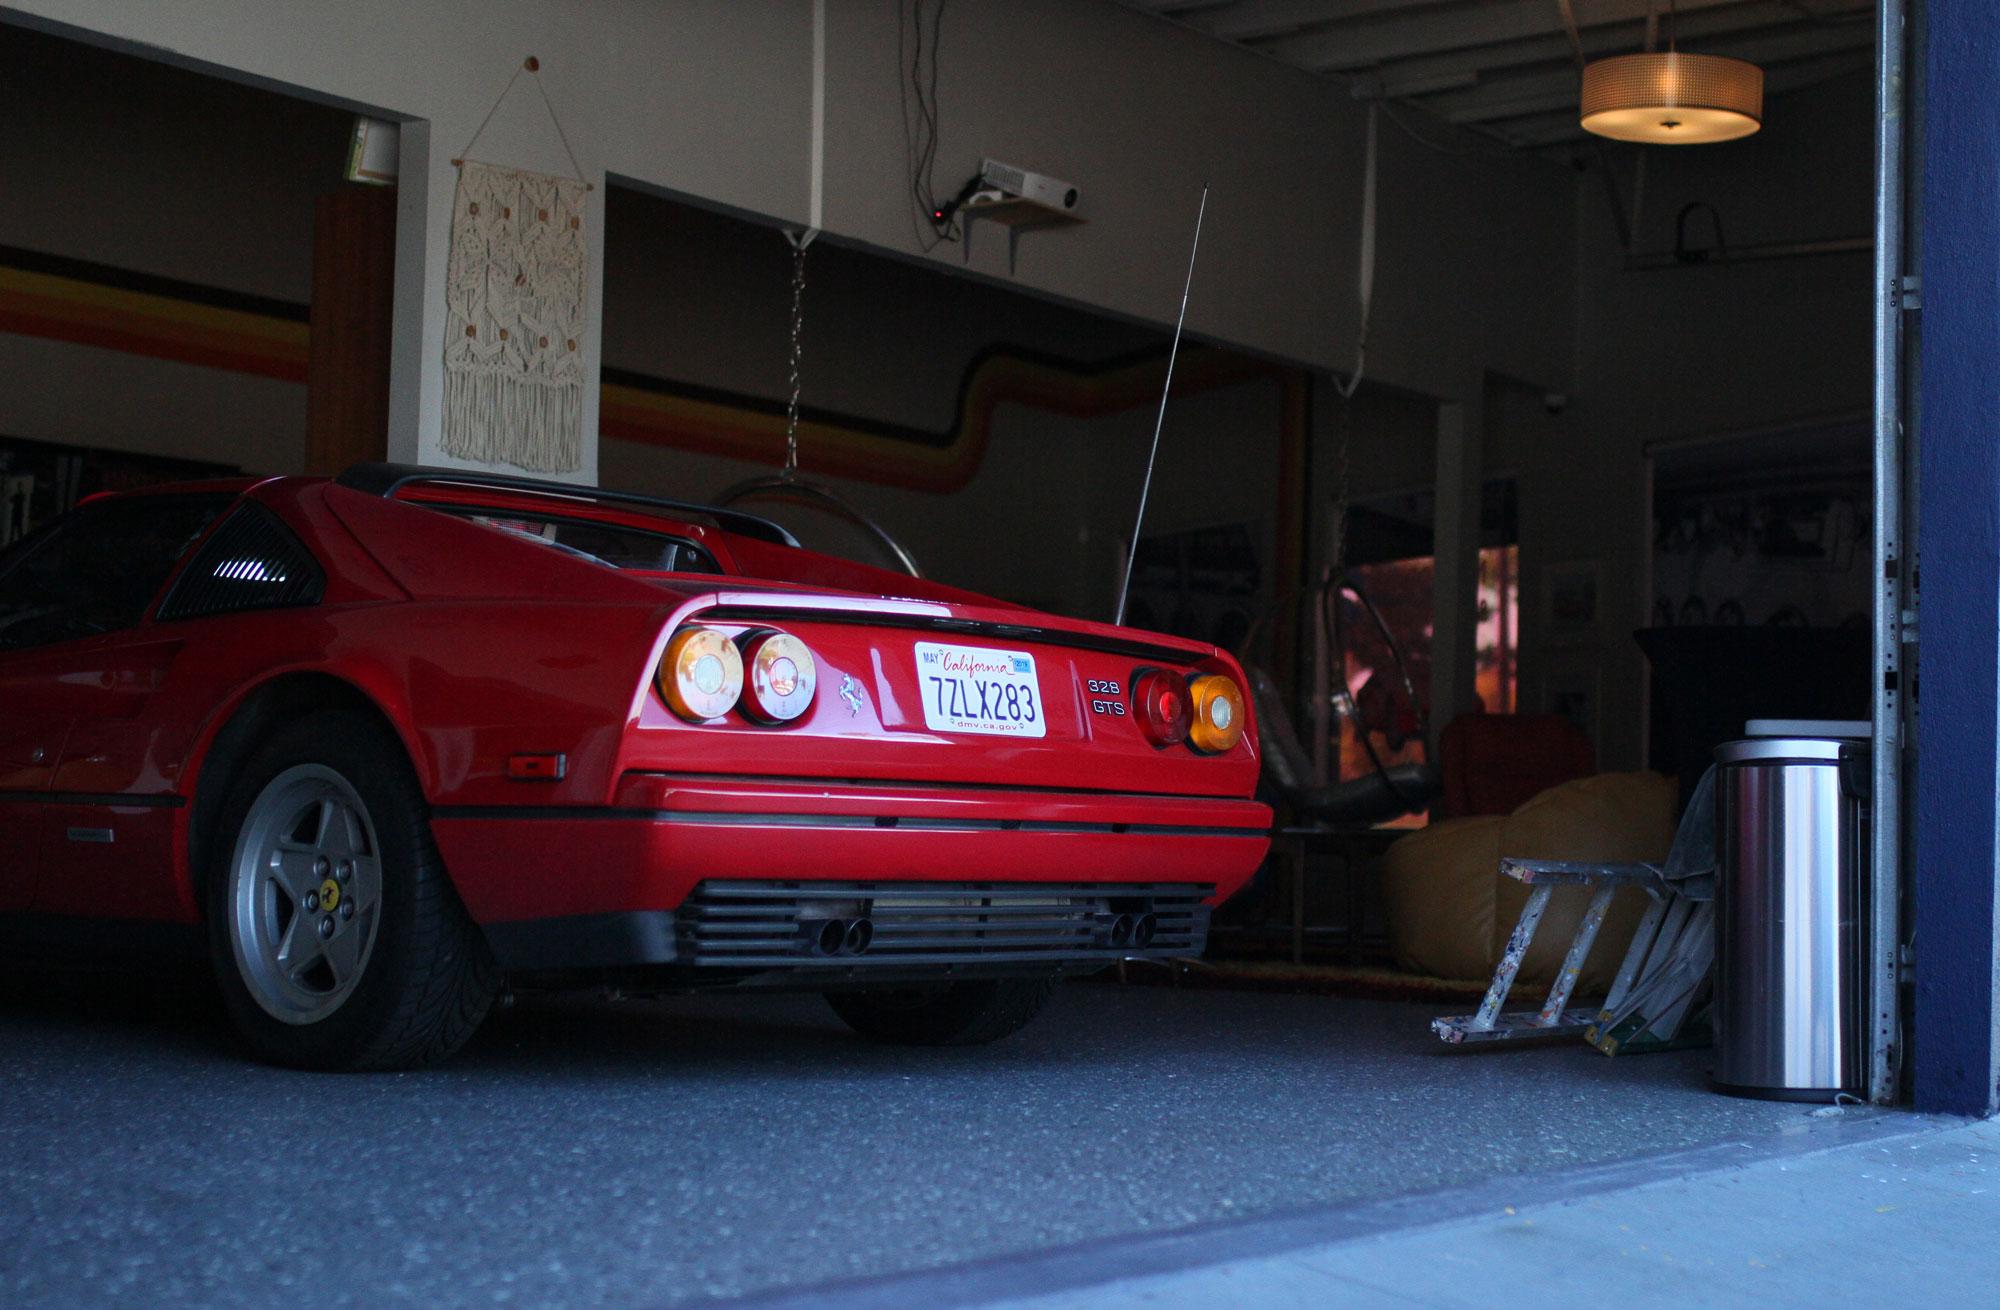 Ferrari 328 gts i framför ett par av helg eventets stegar